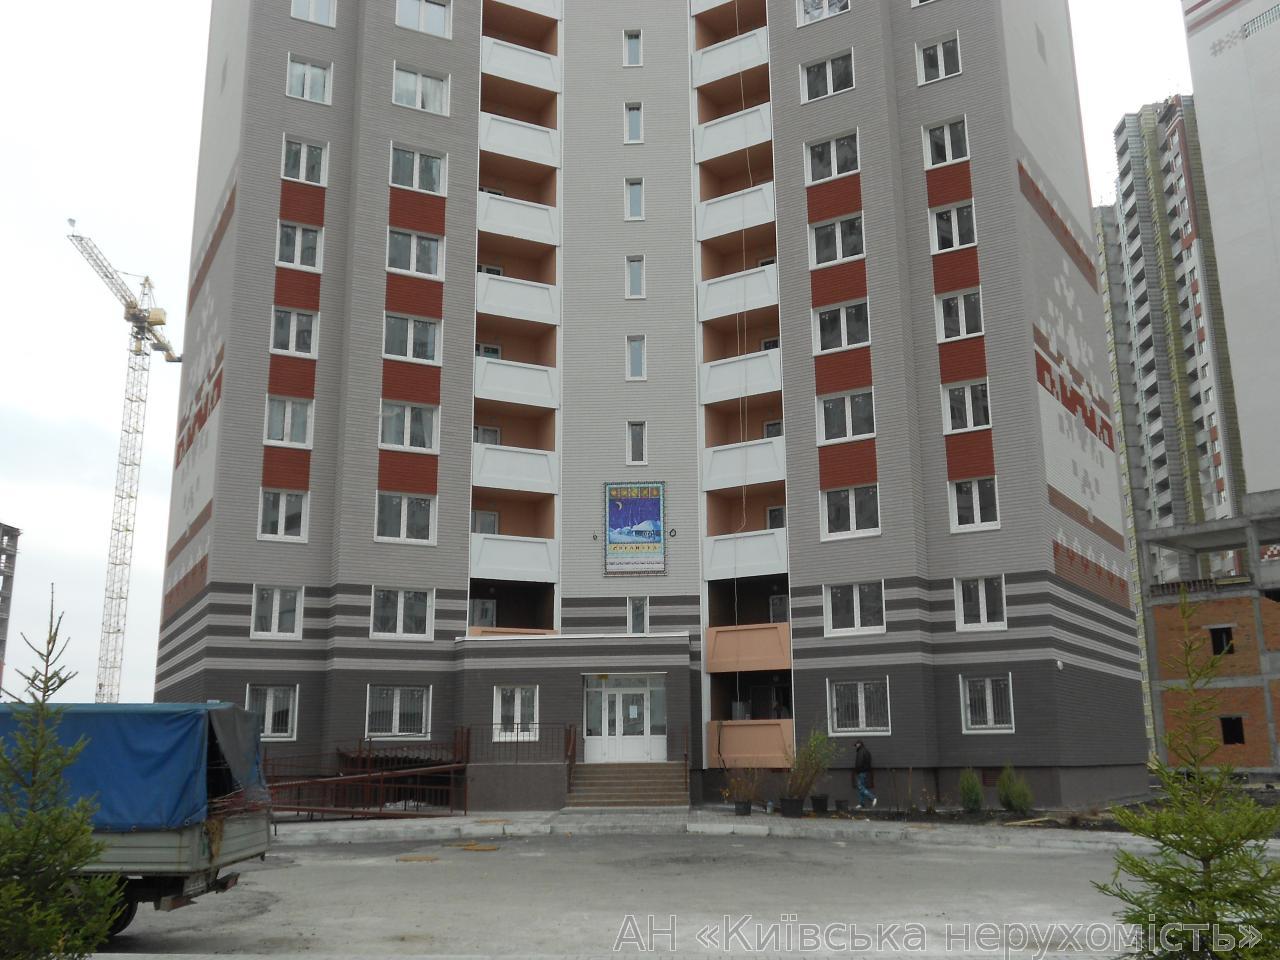 Фото 3 - Продам квартиру Киев, Чавдар Елизаветы ул.